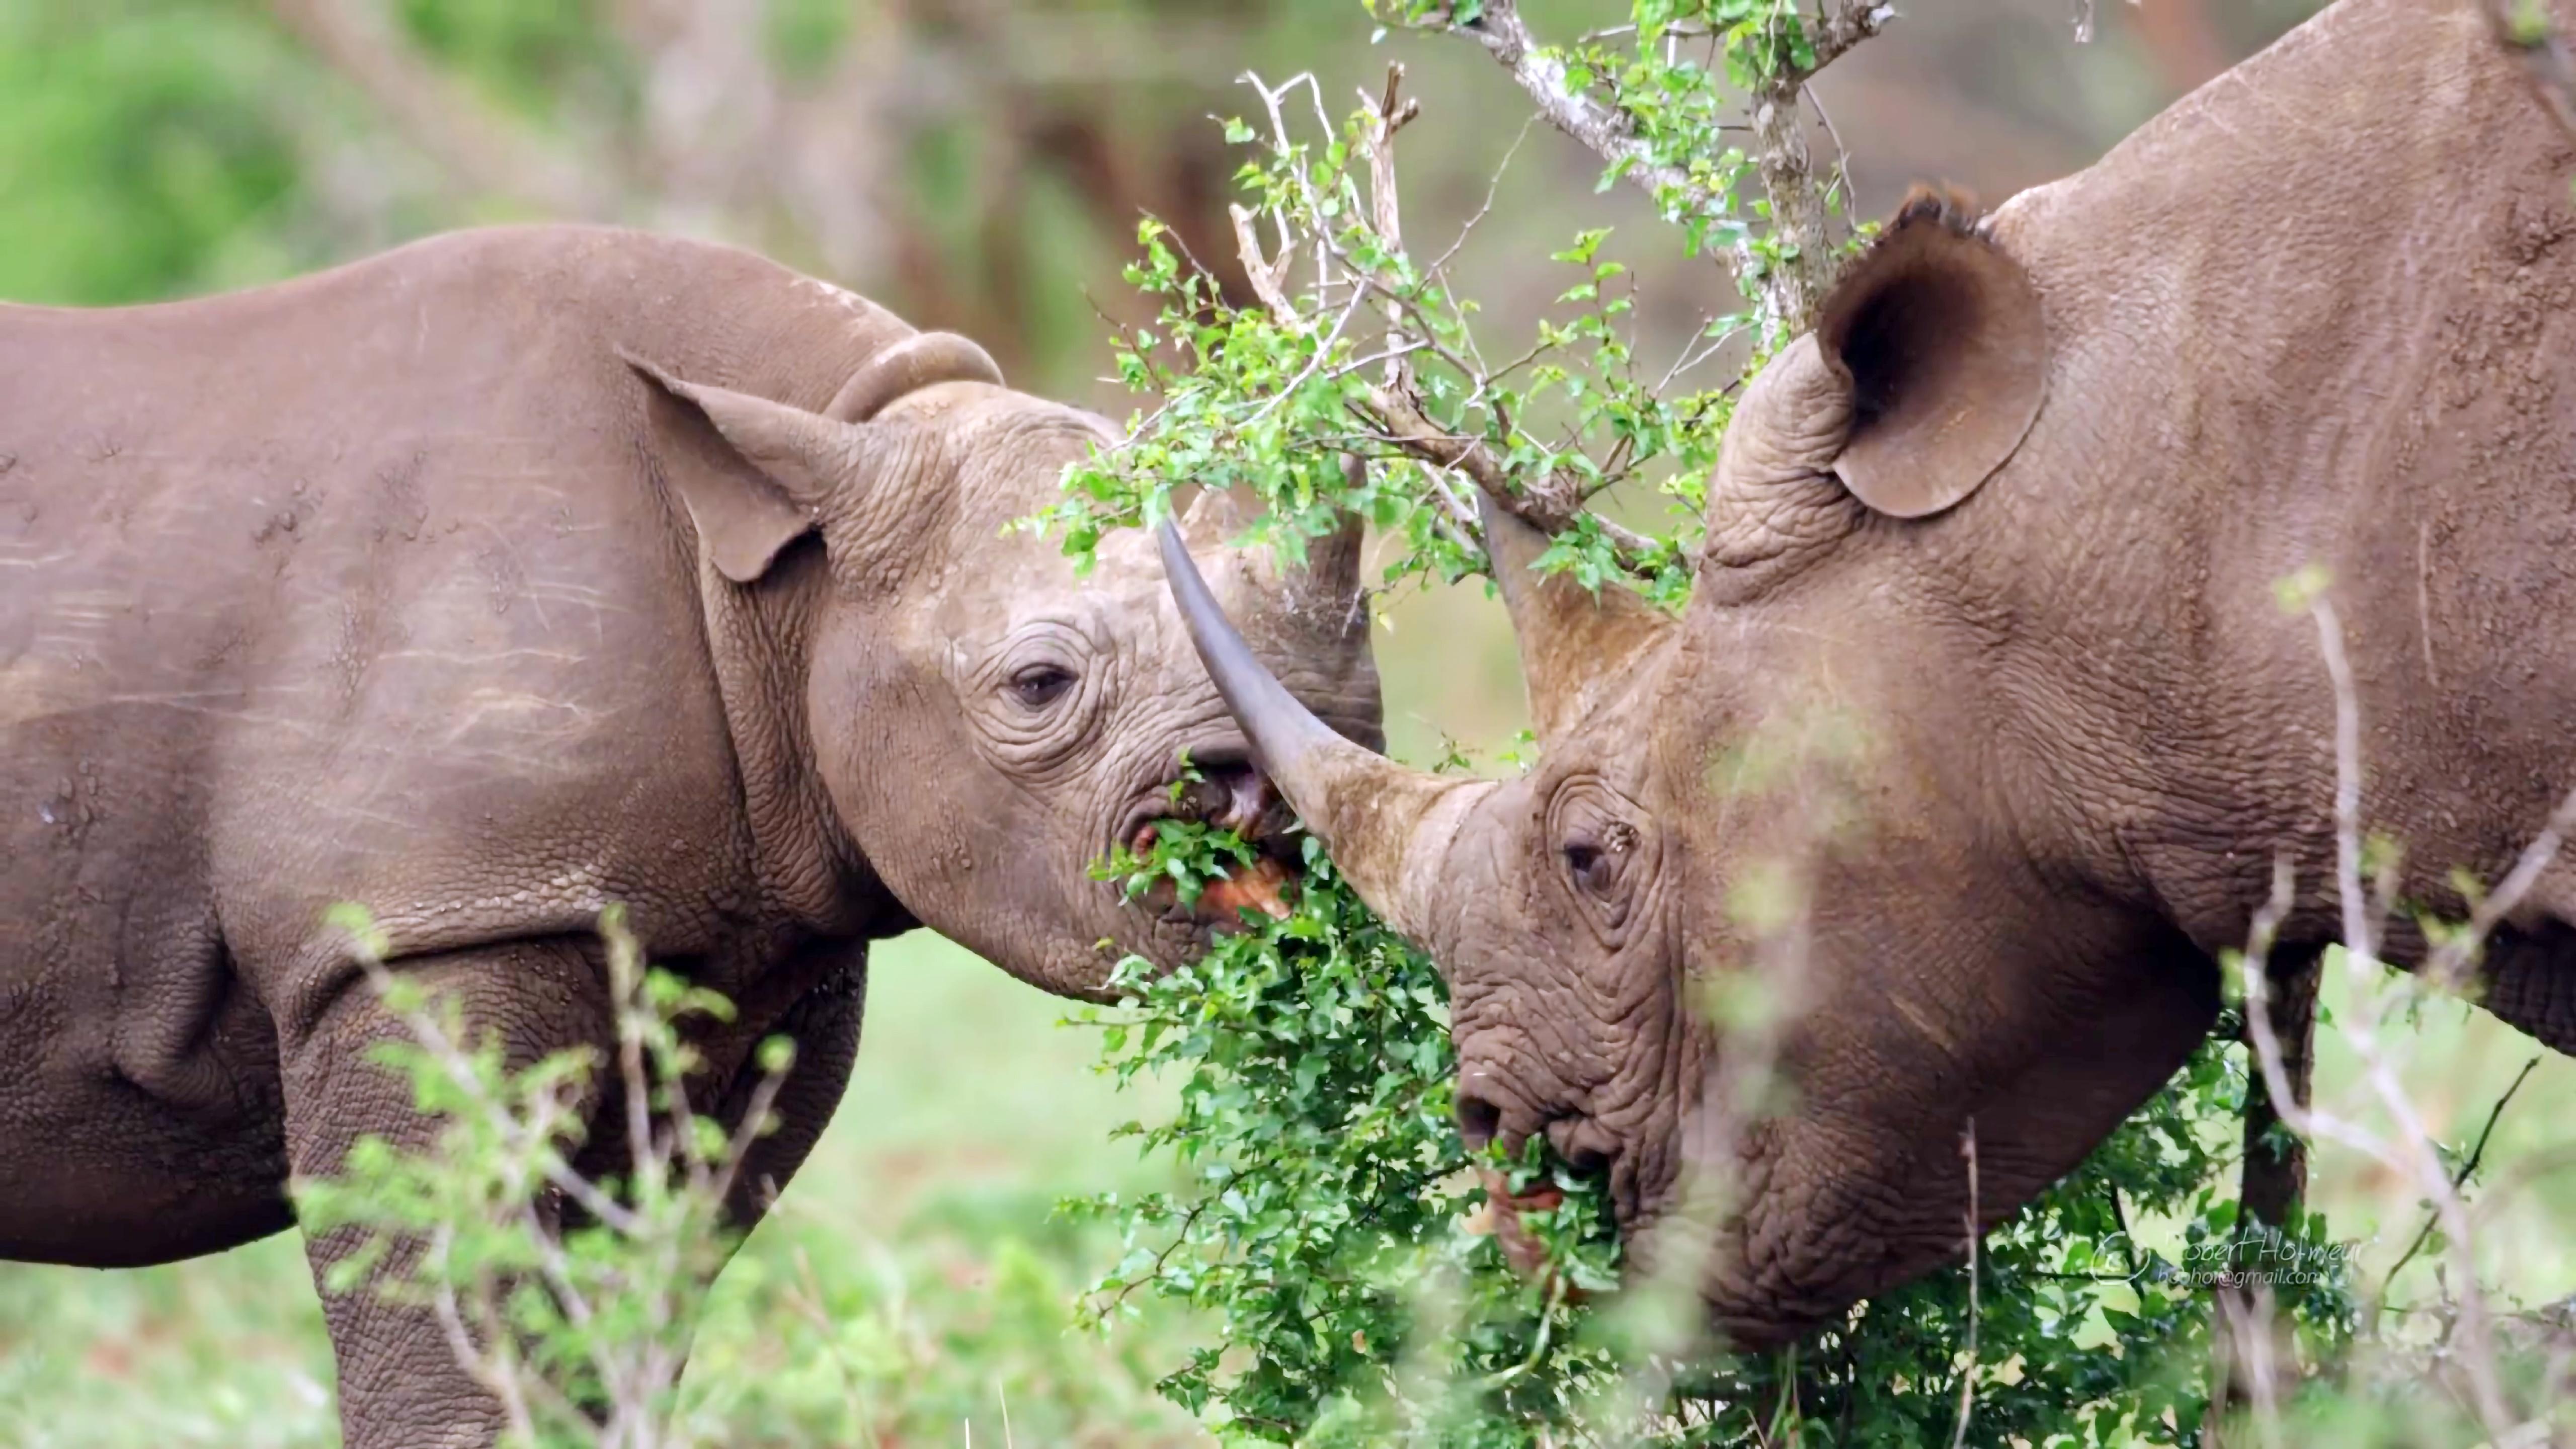 Rhinoceroses wallpaper